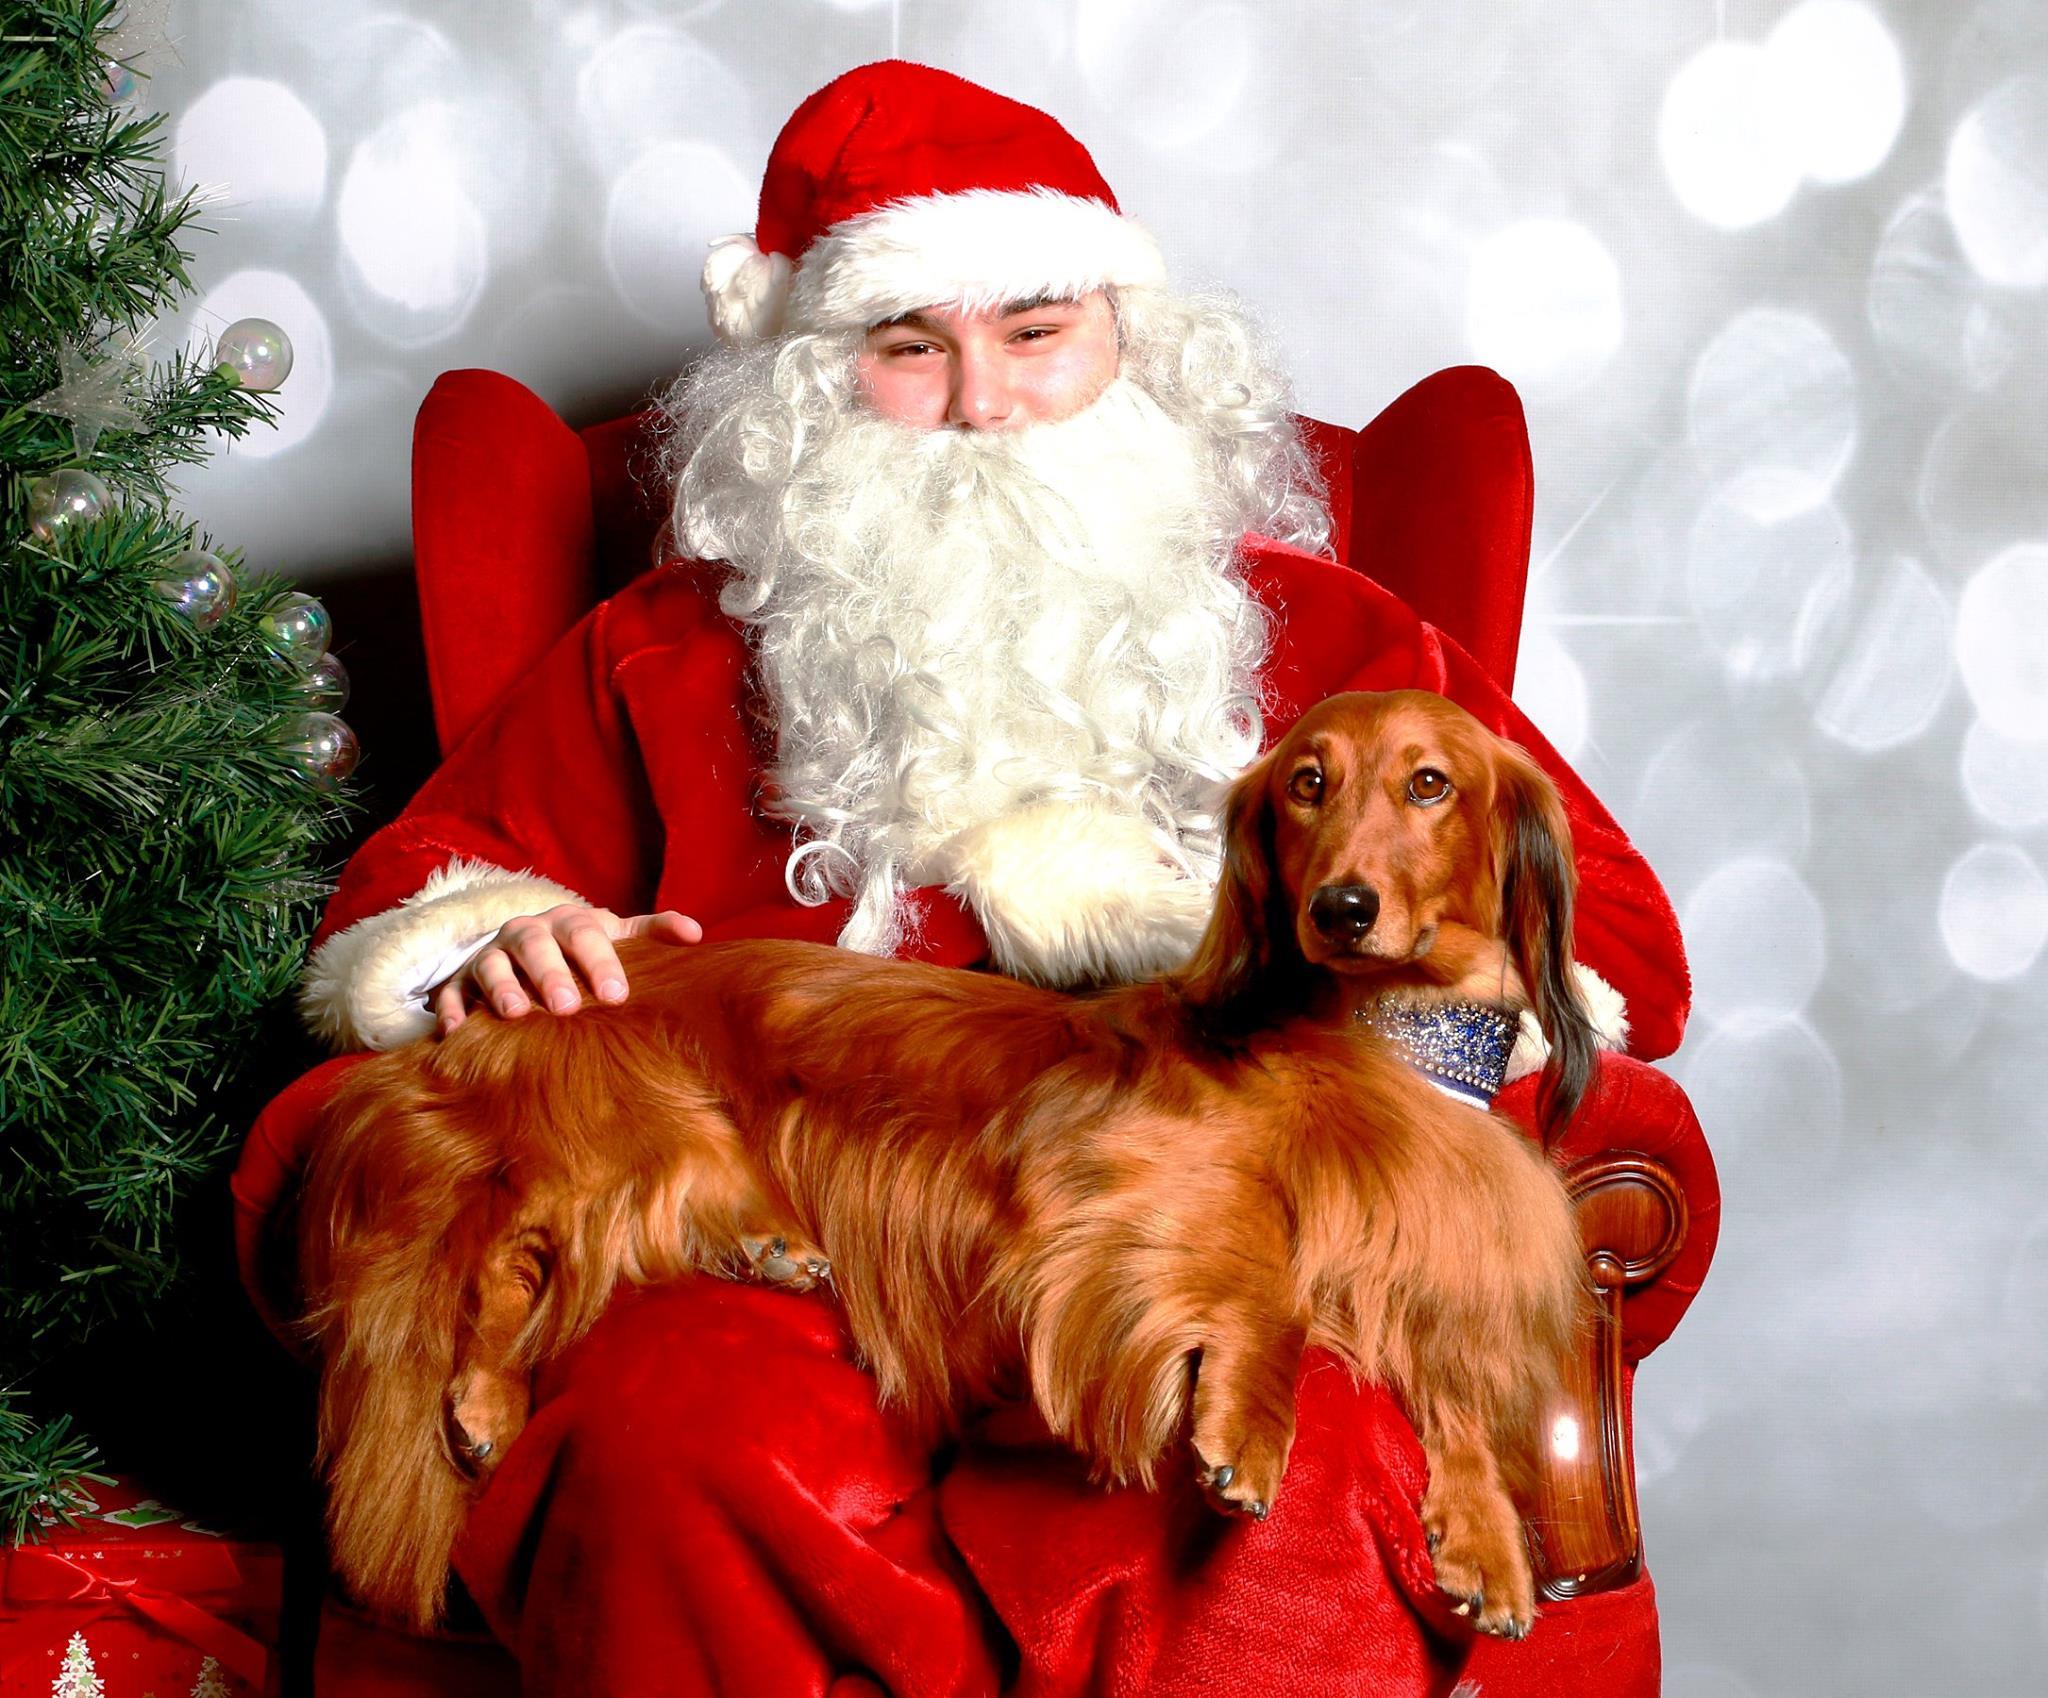 Jimmy & Santa Wish You a Very Happy Christmas!